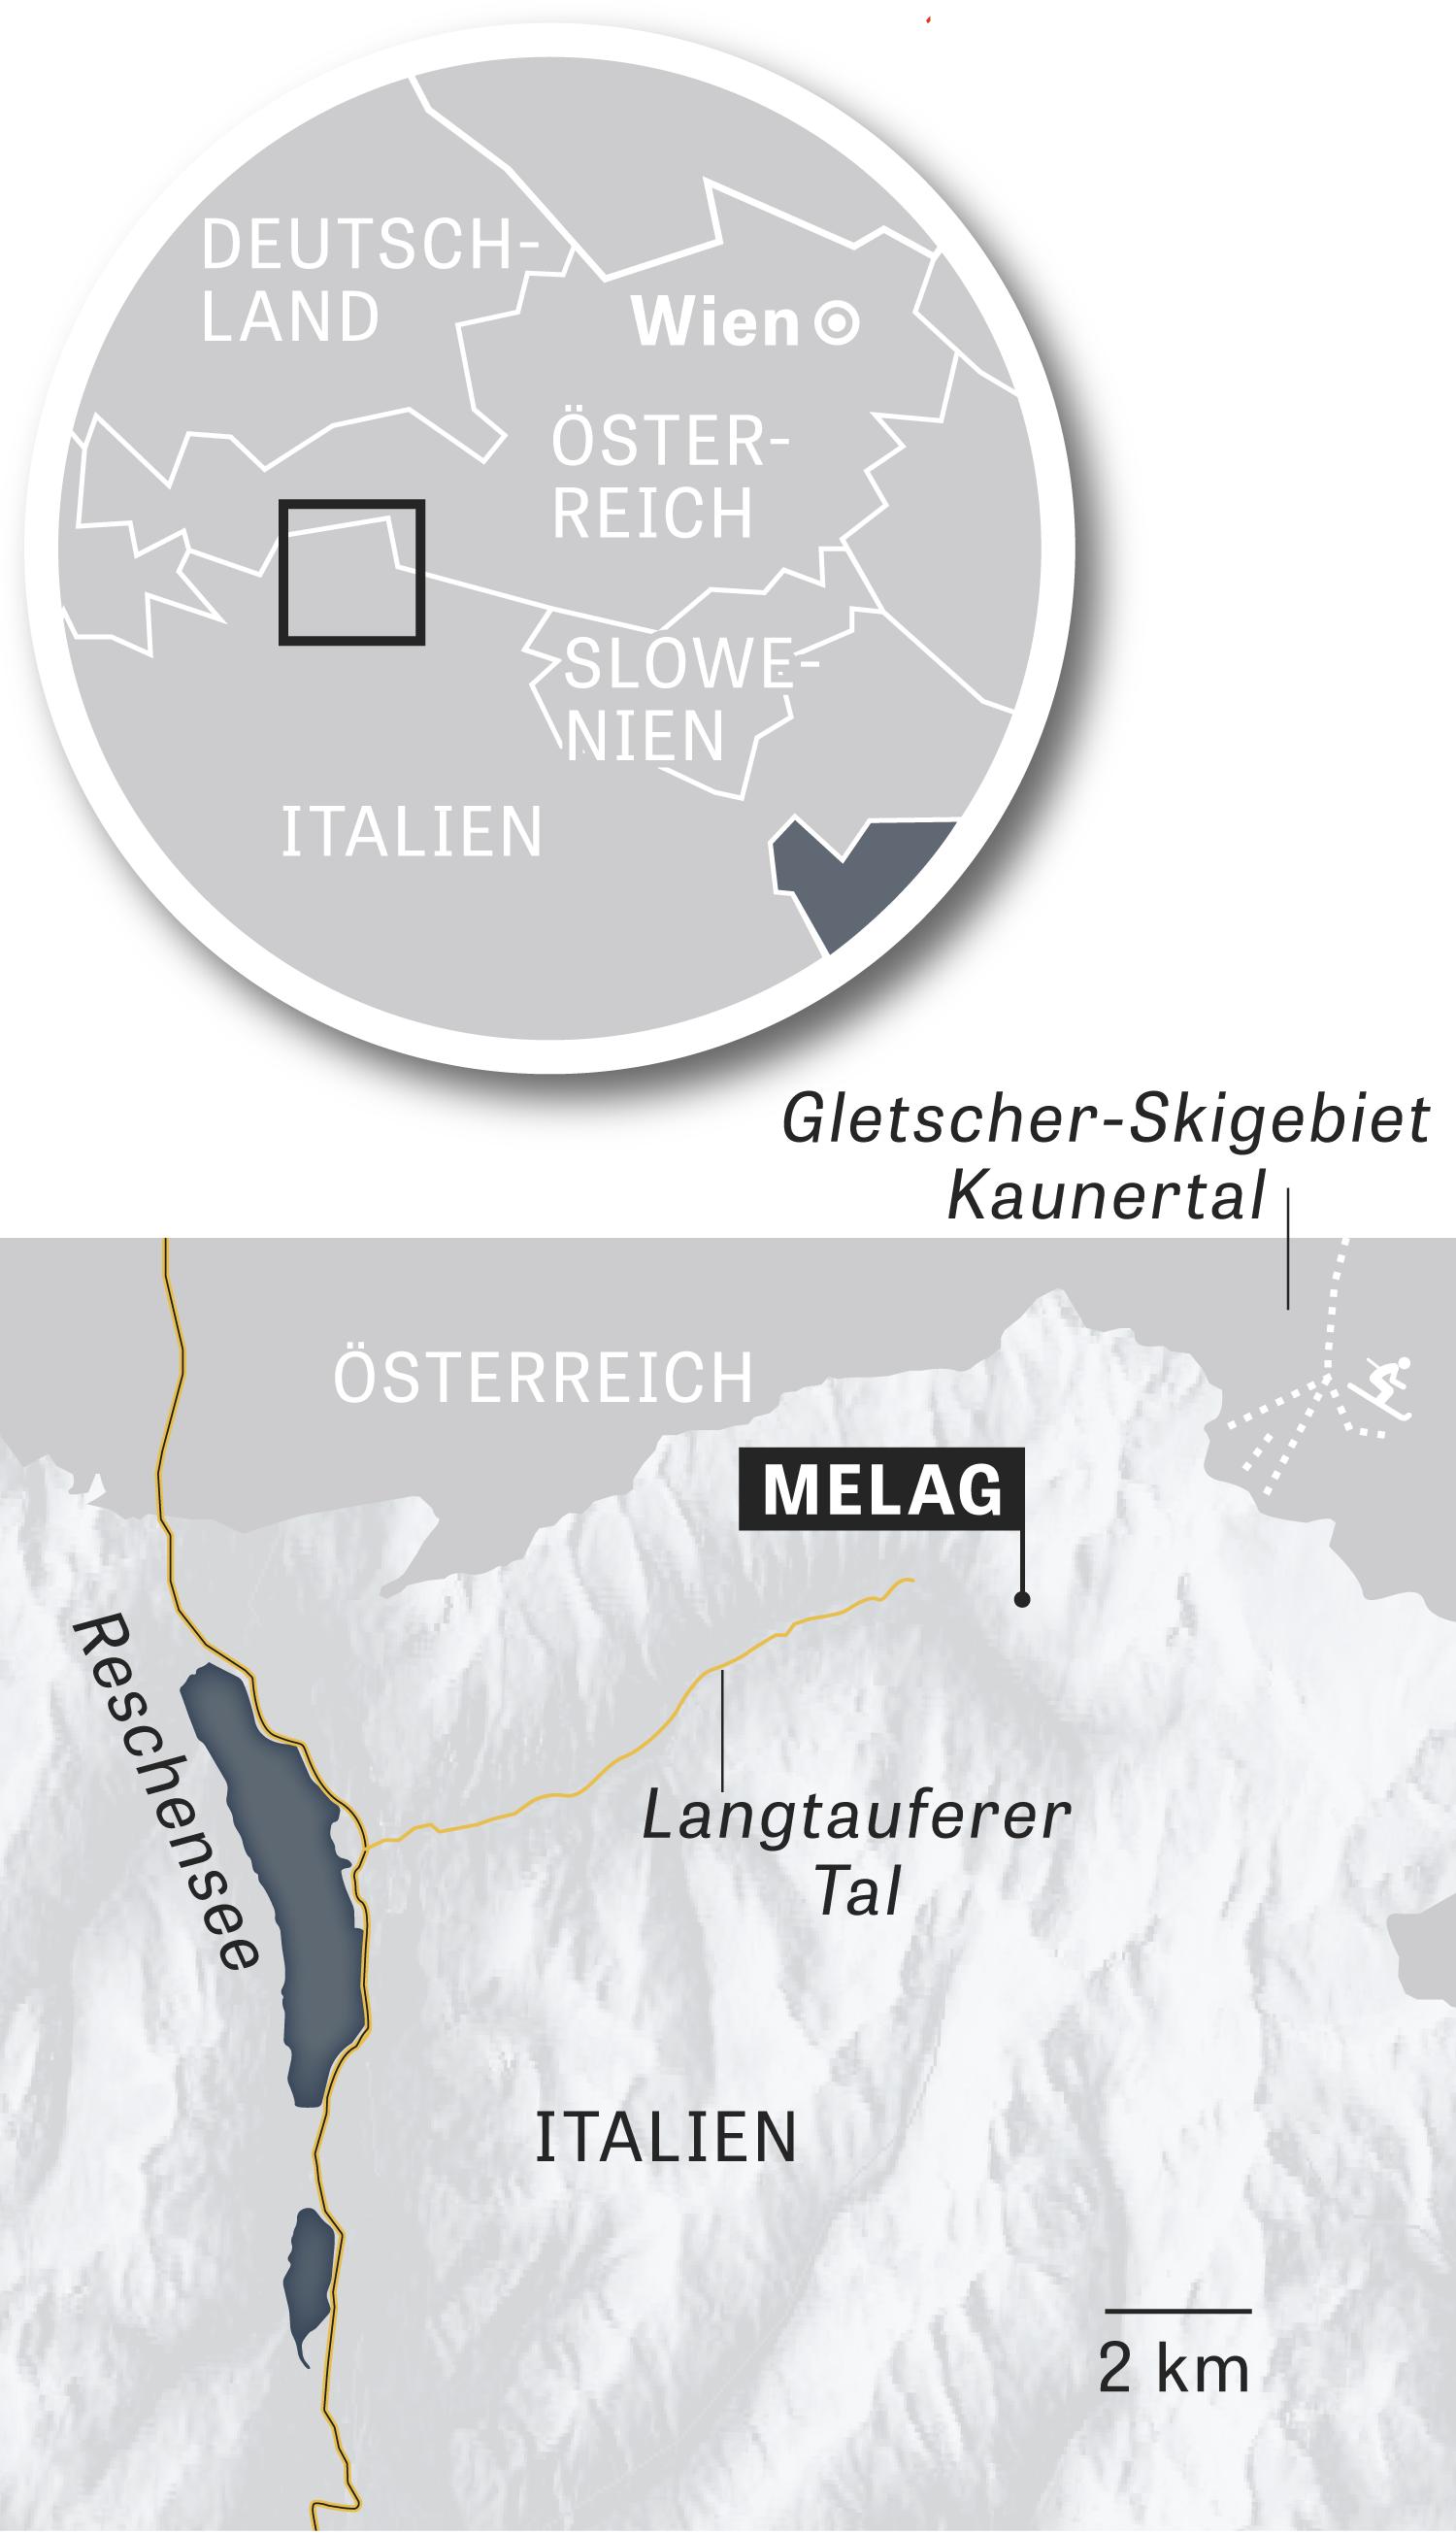 Kaunertal: Dreißig Jahre Pistenkrieg